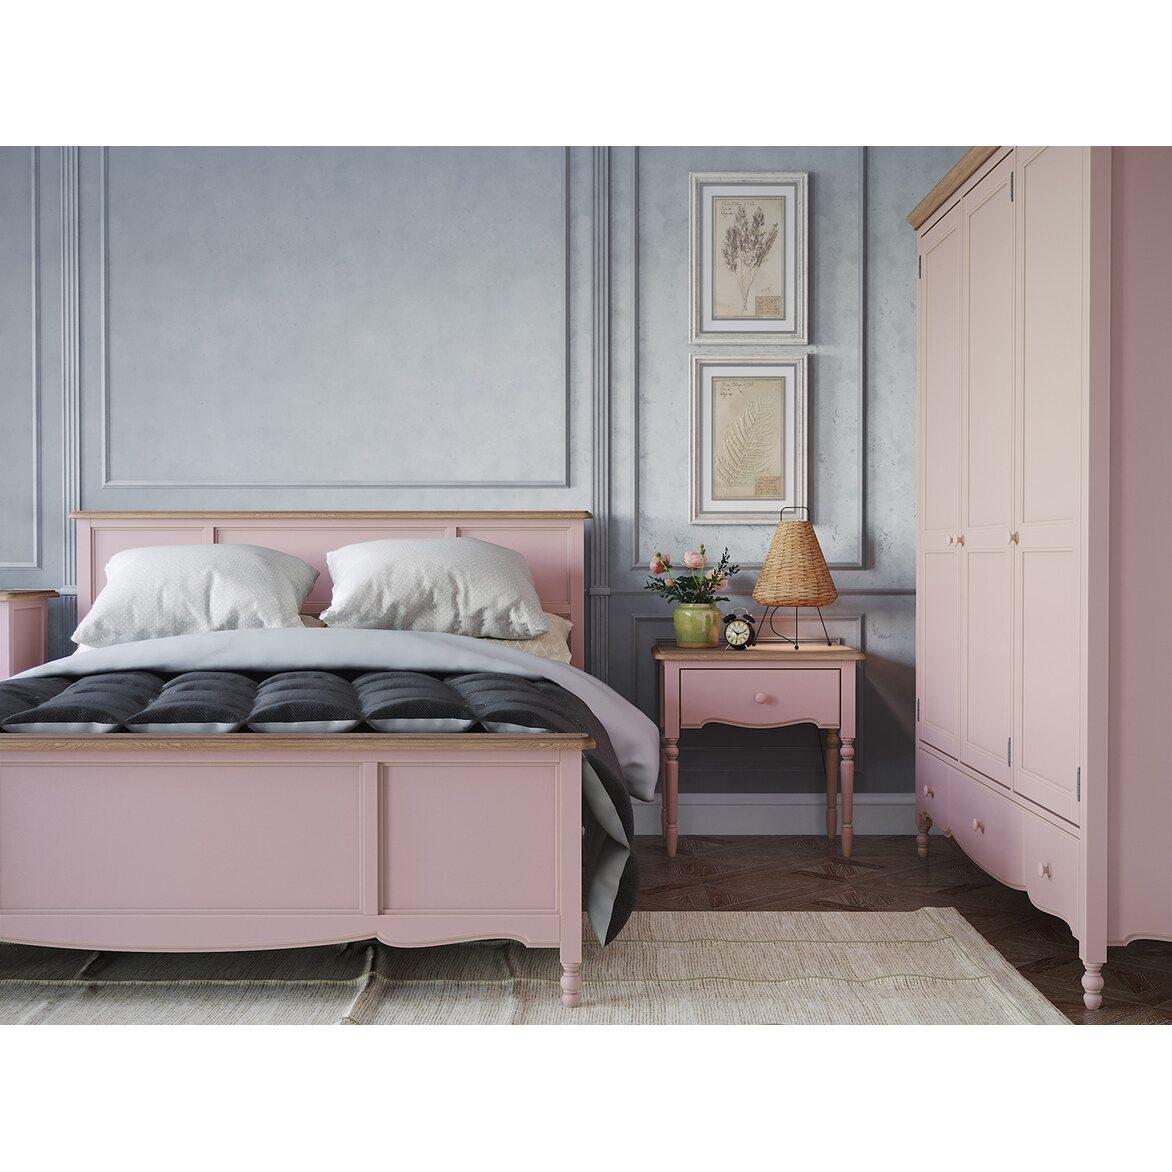 Кровать двуспальная 160*200 Leblanc, лаванда 5 | Двуспальные кровати Kingsby